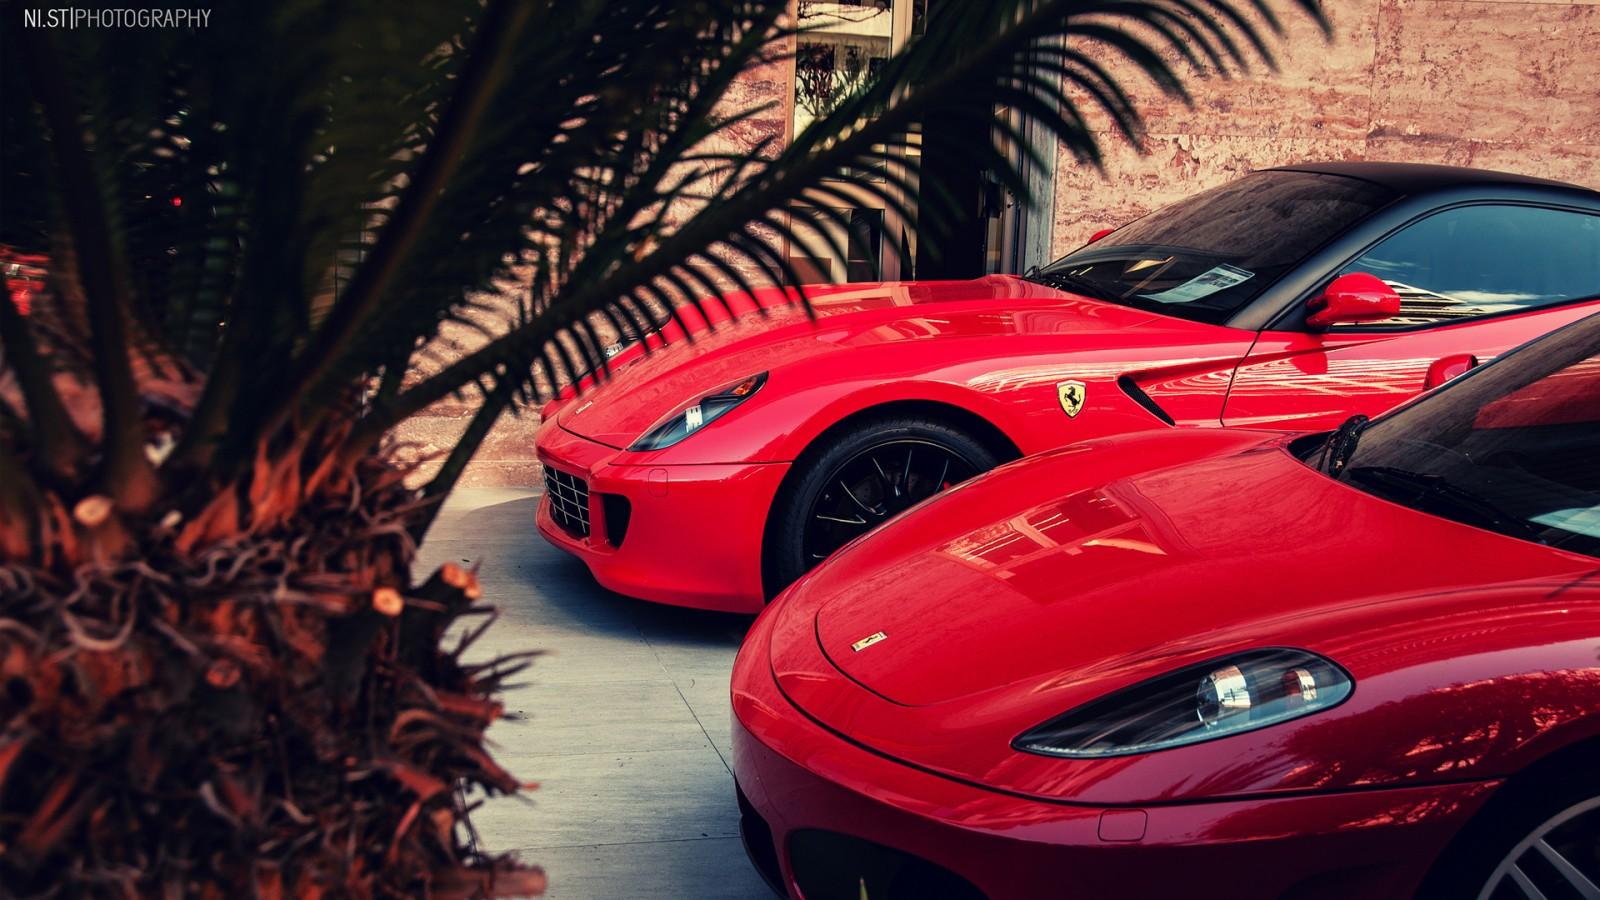 Ferrari Cars Wallpaper Hd Car Wallpapers Id 3361